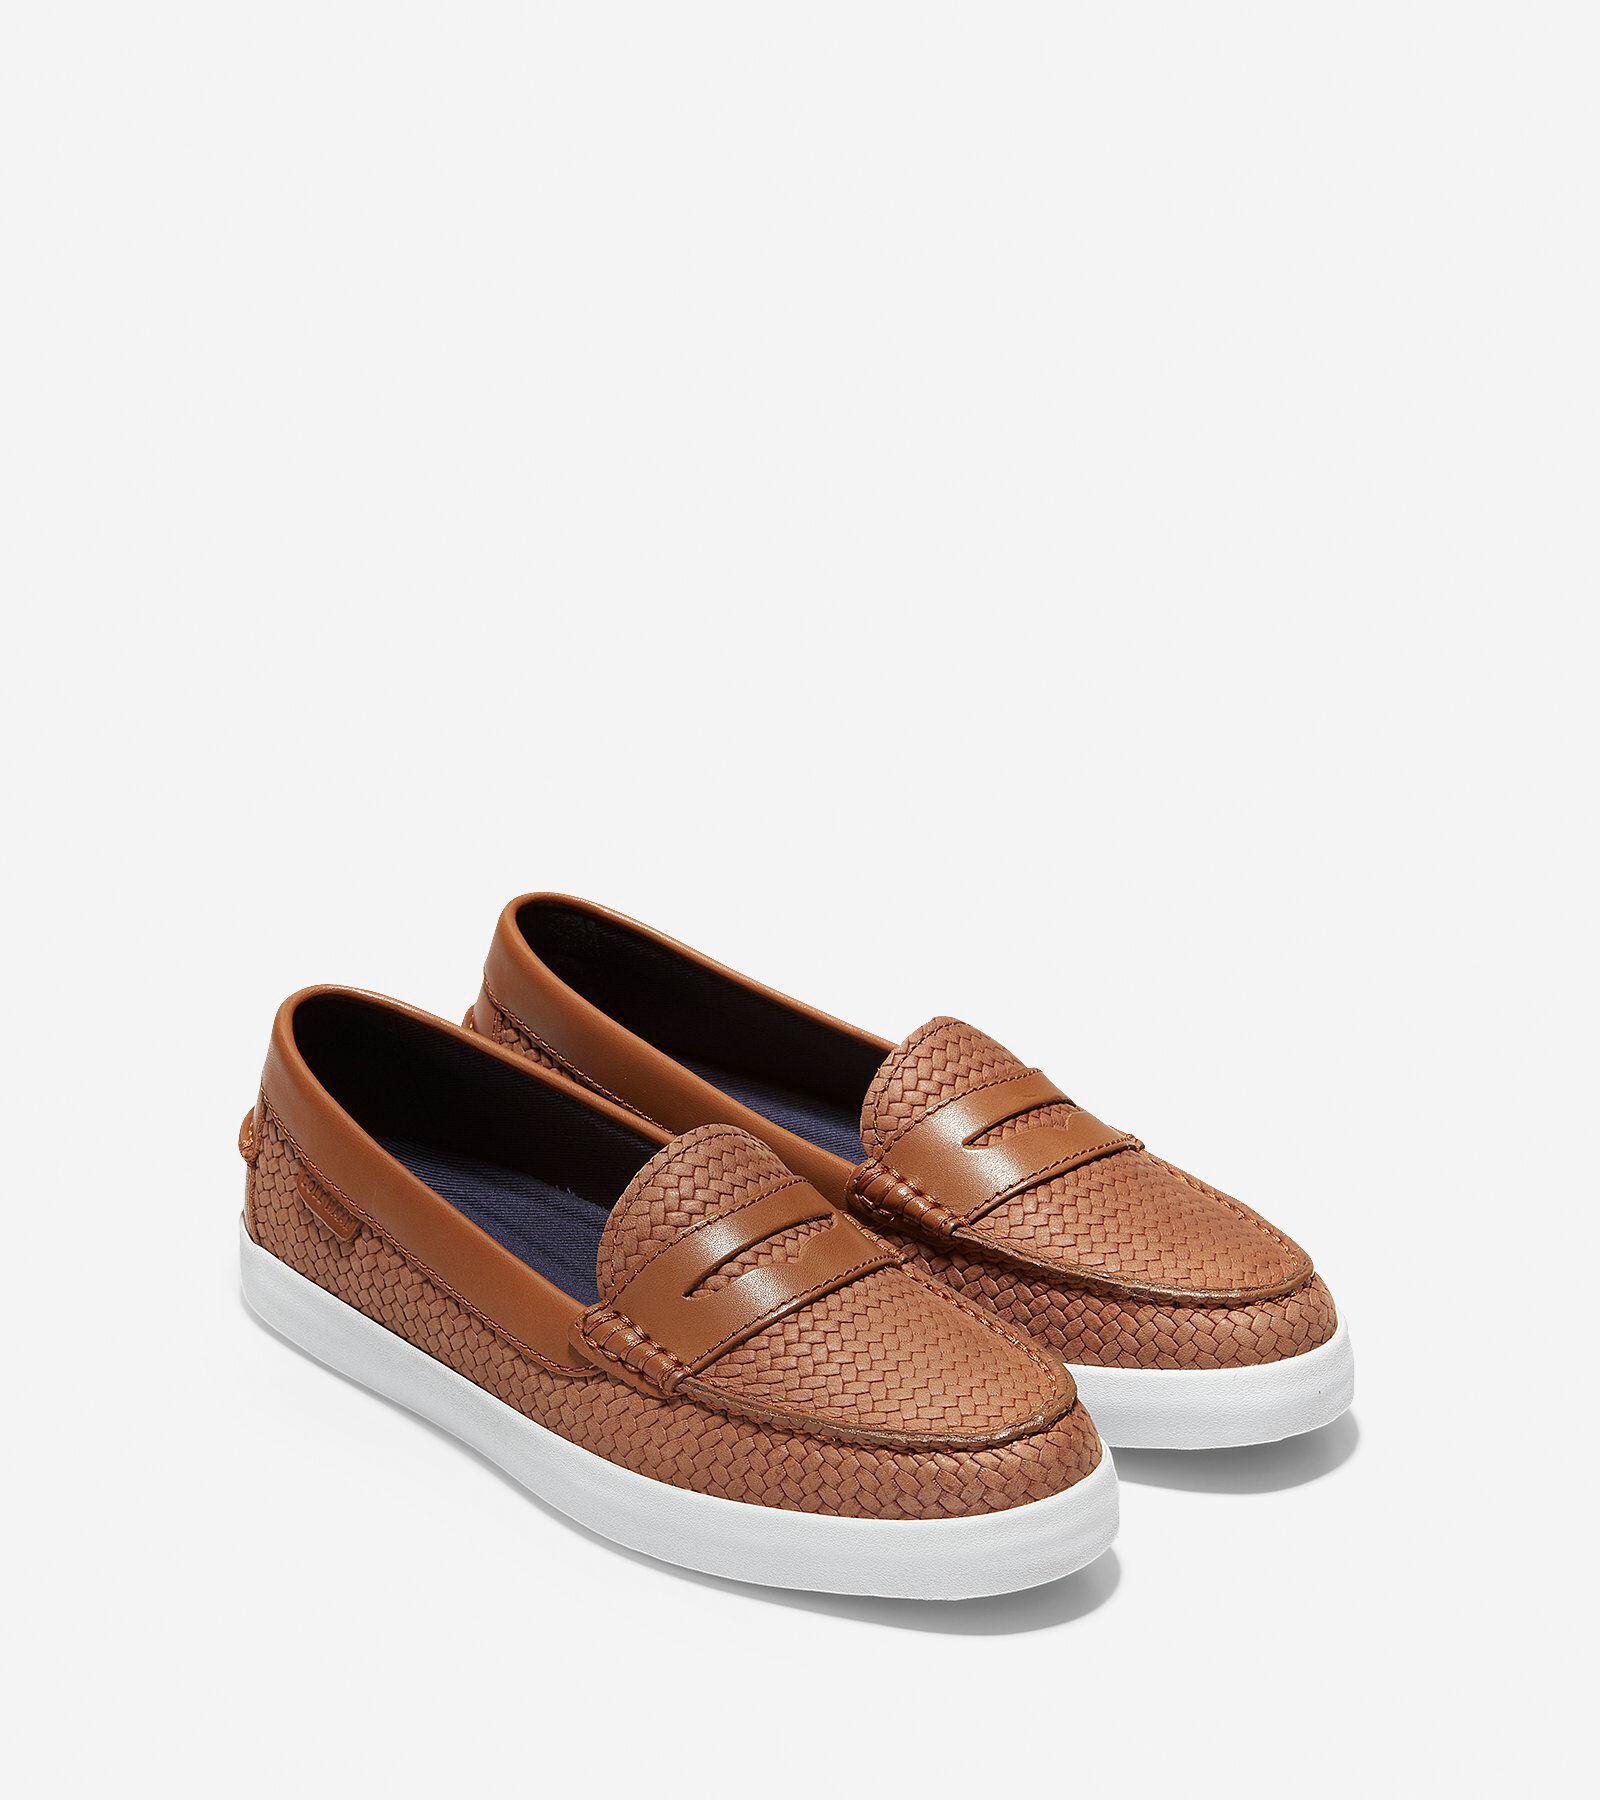 b351b547406 Womens nantucket loafers in british tan weave cole haan jpg 2000x2250 Tan  womens loafers